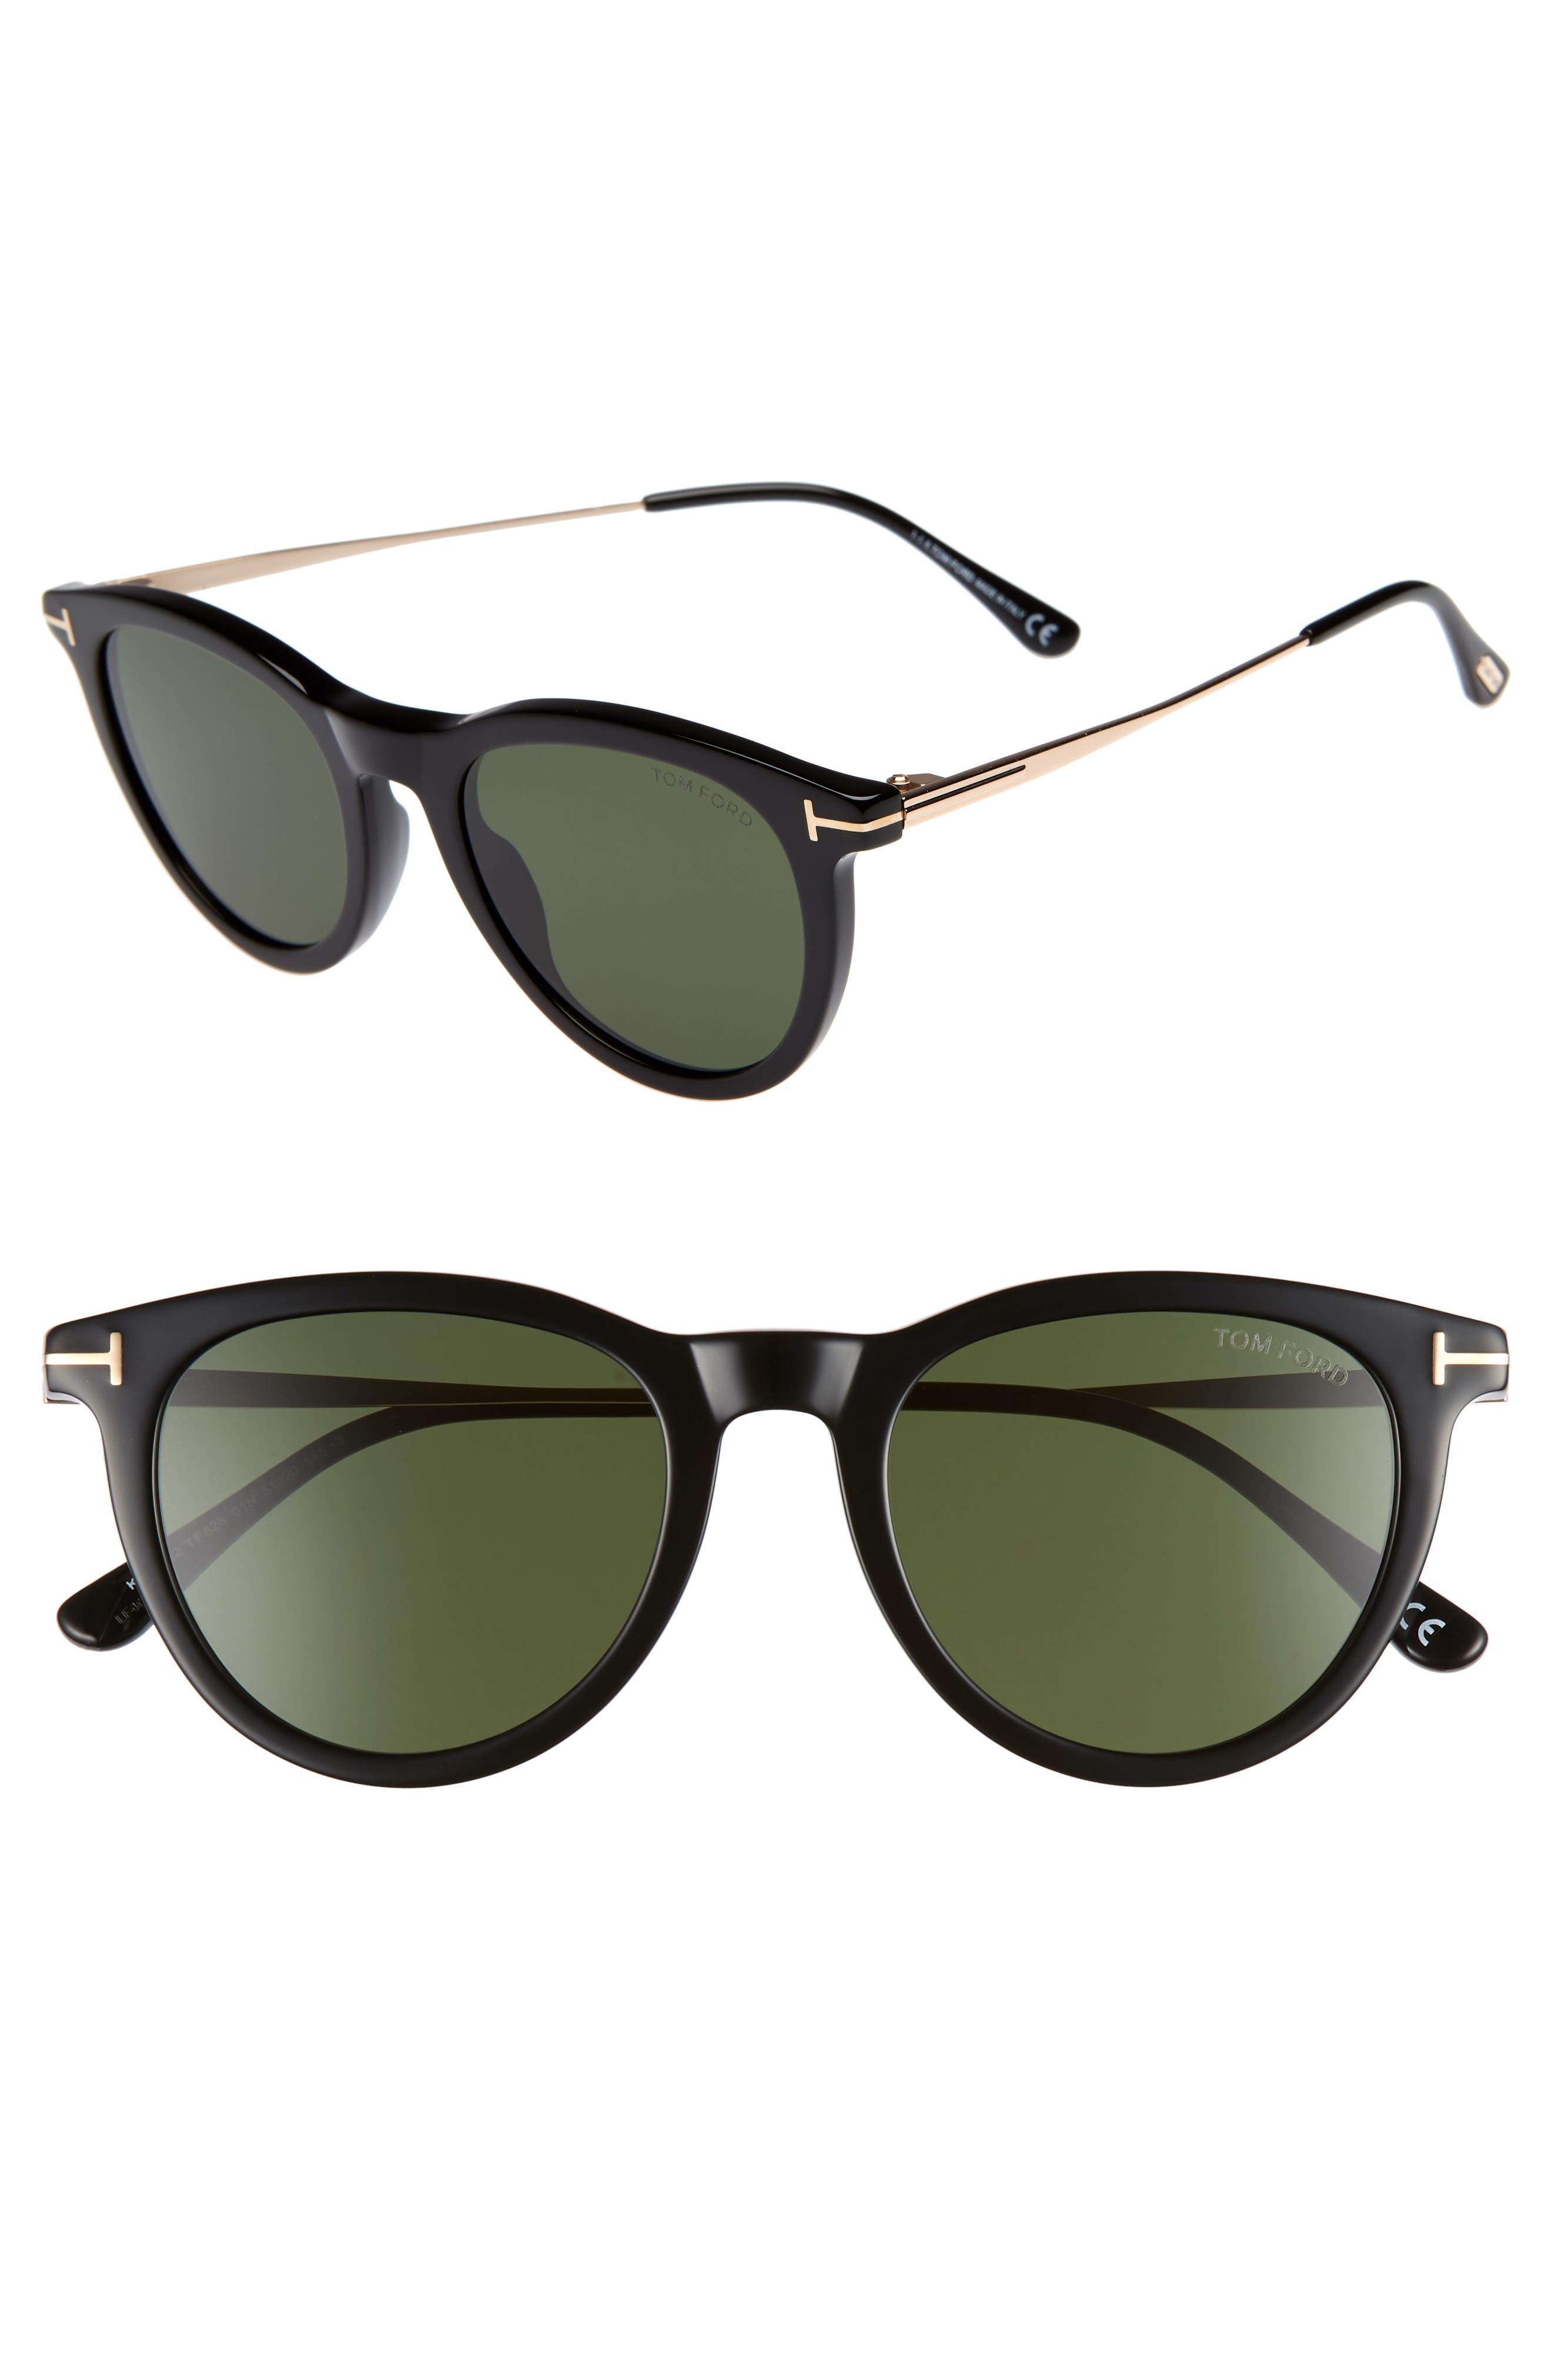 51mm Cat Eye Sunglasses,                             Main thumbnail 1, color,                             SHINY BLACK/ GREEN